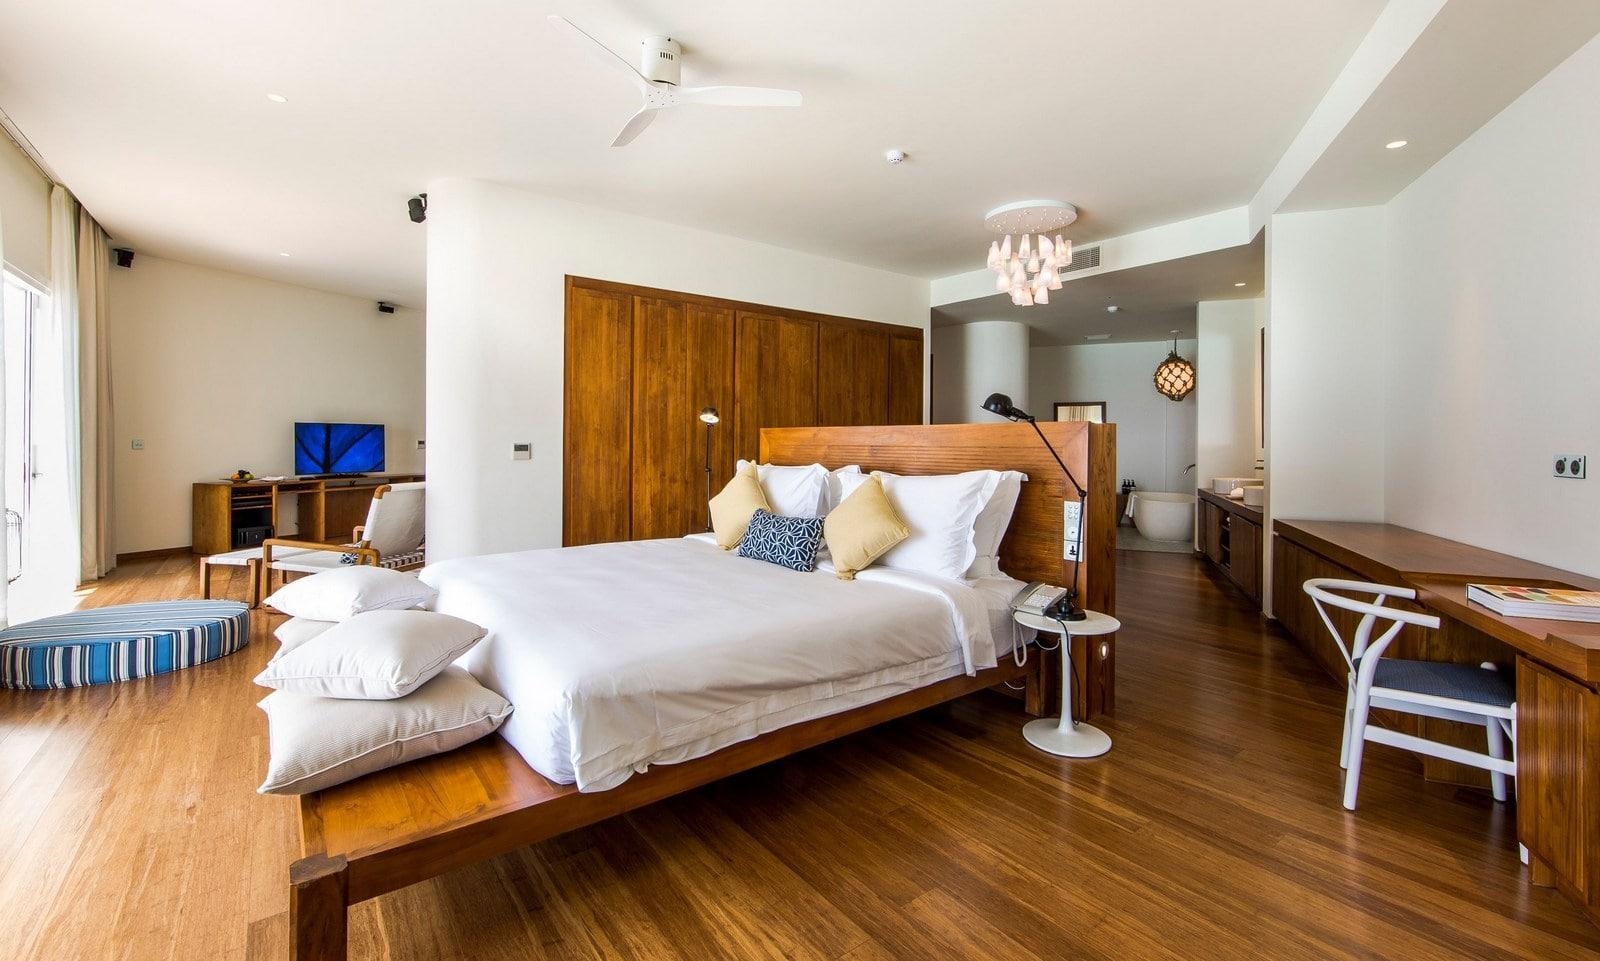 Мальдивы, Отель Amilla Fushi Maldives, номер Lagoon Water Pool Villa